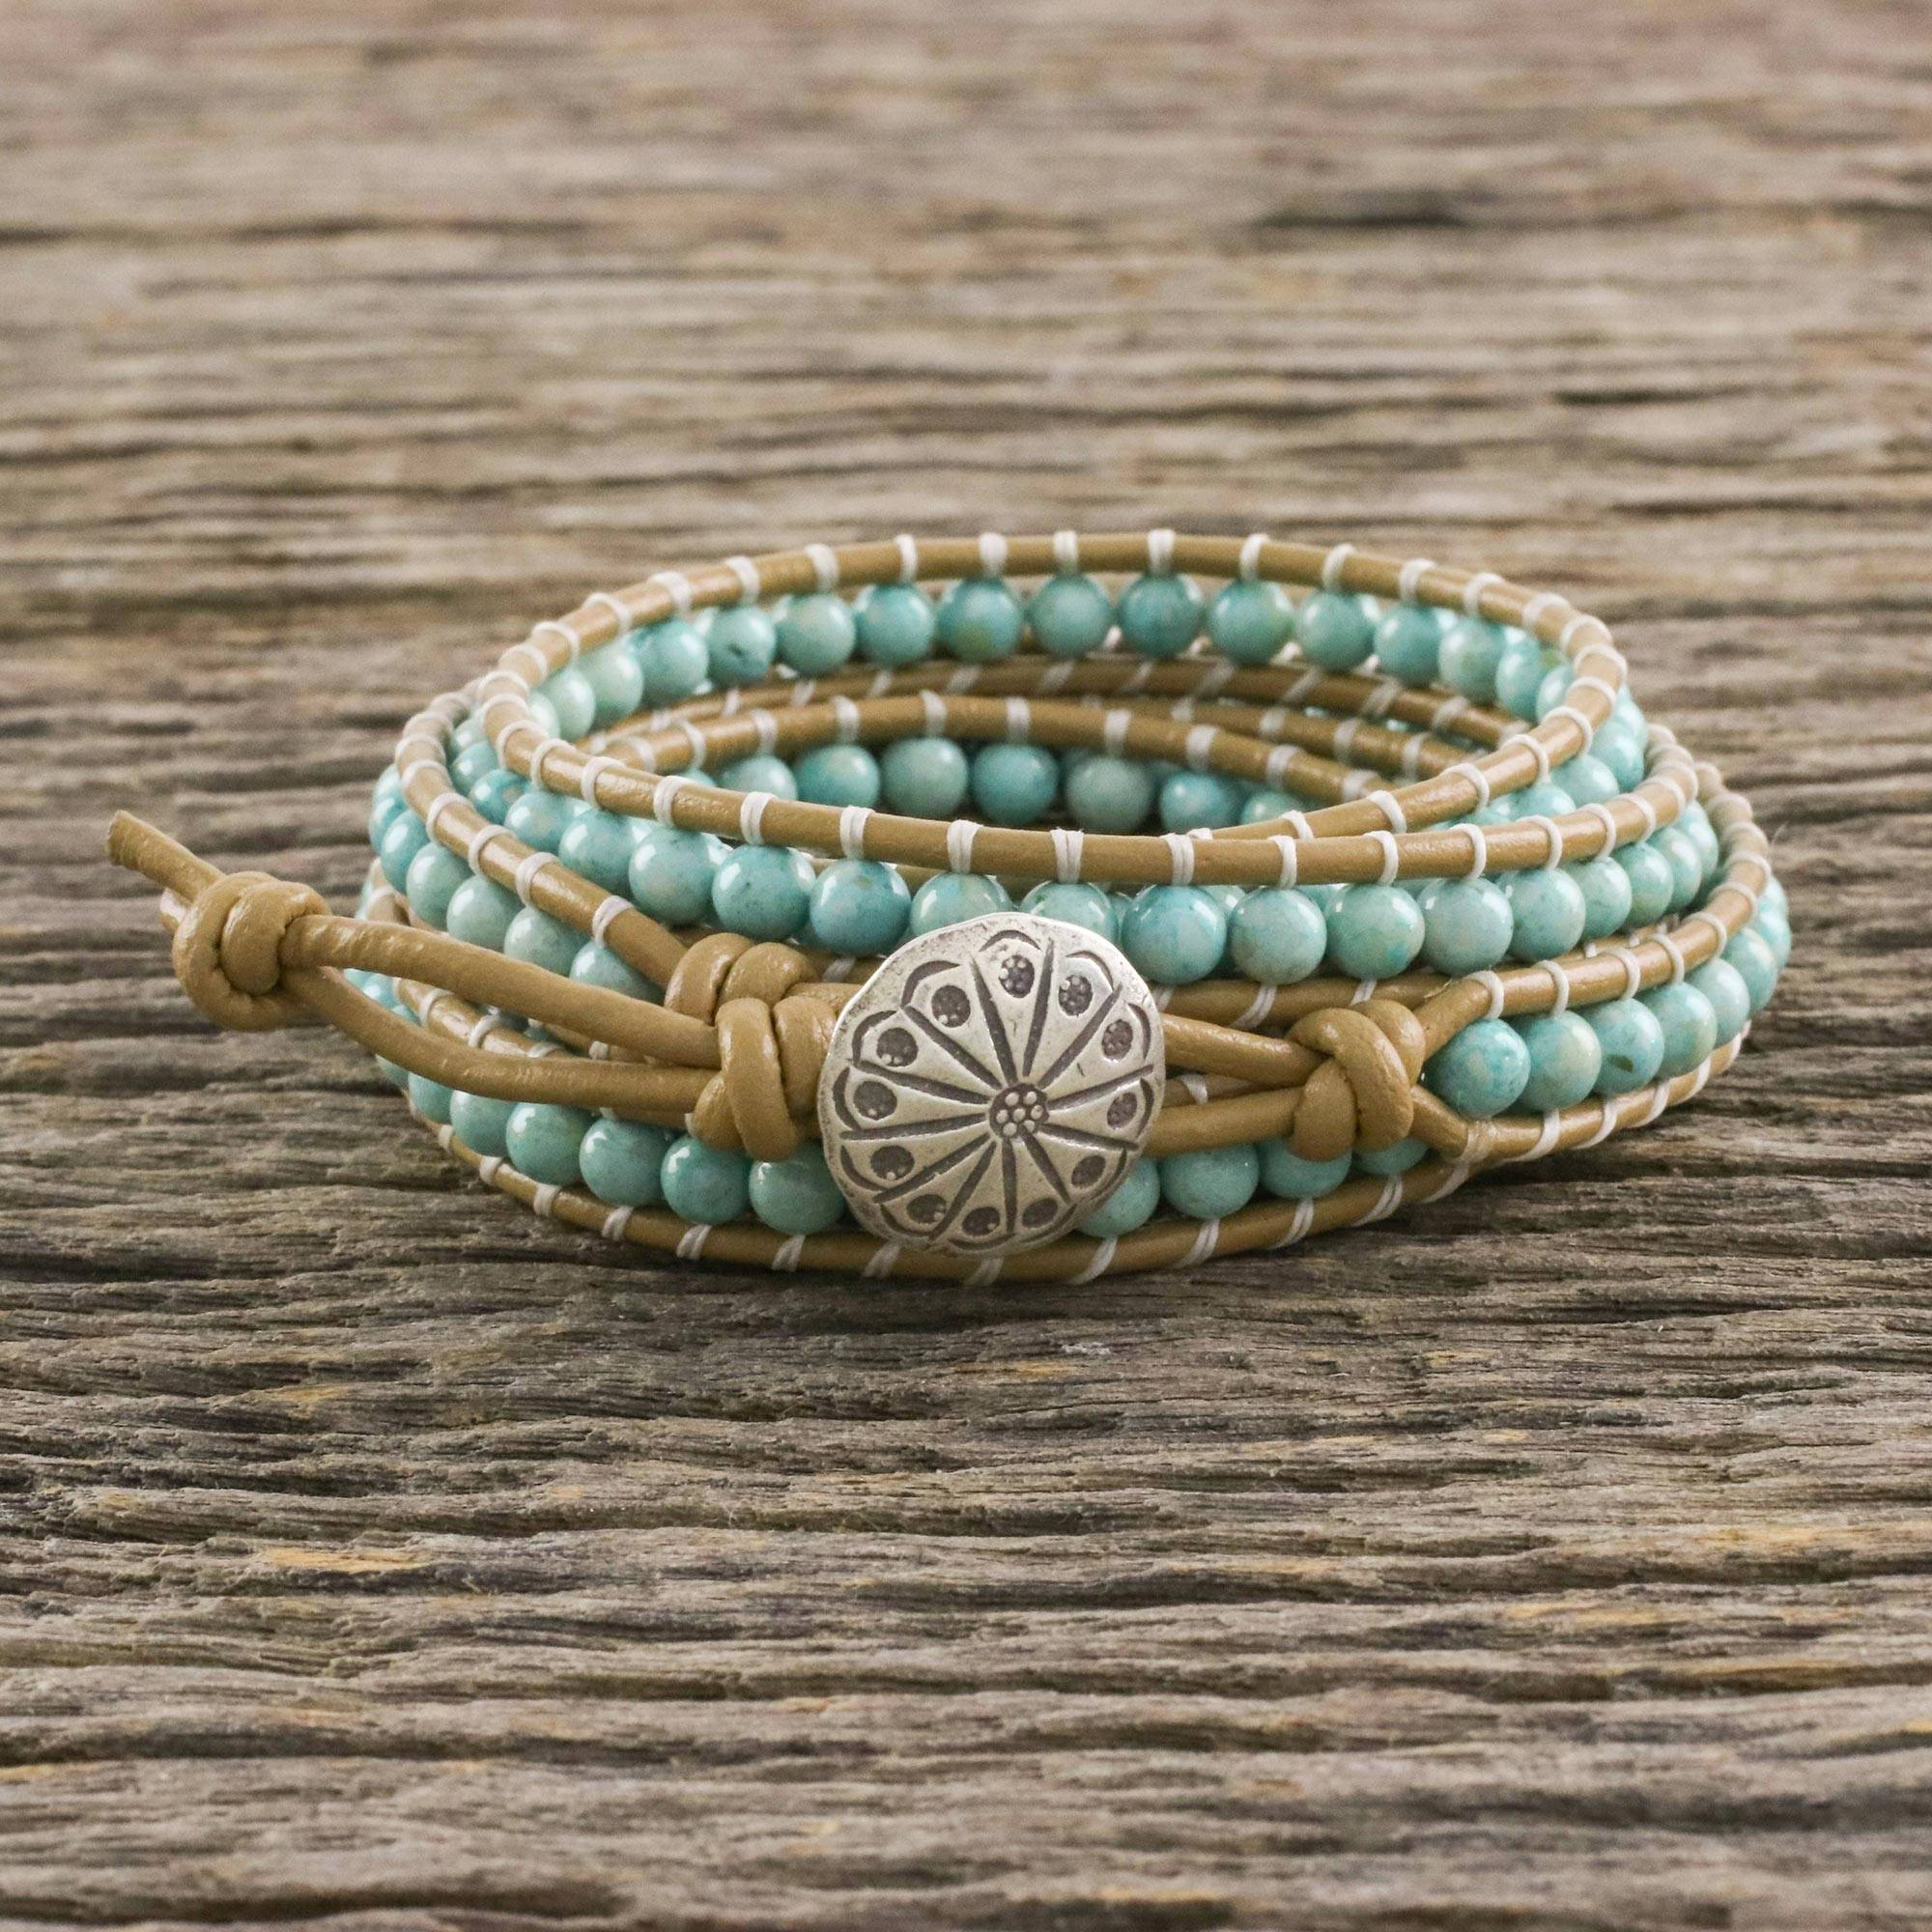 Aqua Serpentine Hand Knotted Wrap Bracelet from Thailand, 'Thai Mint'